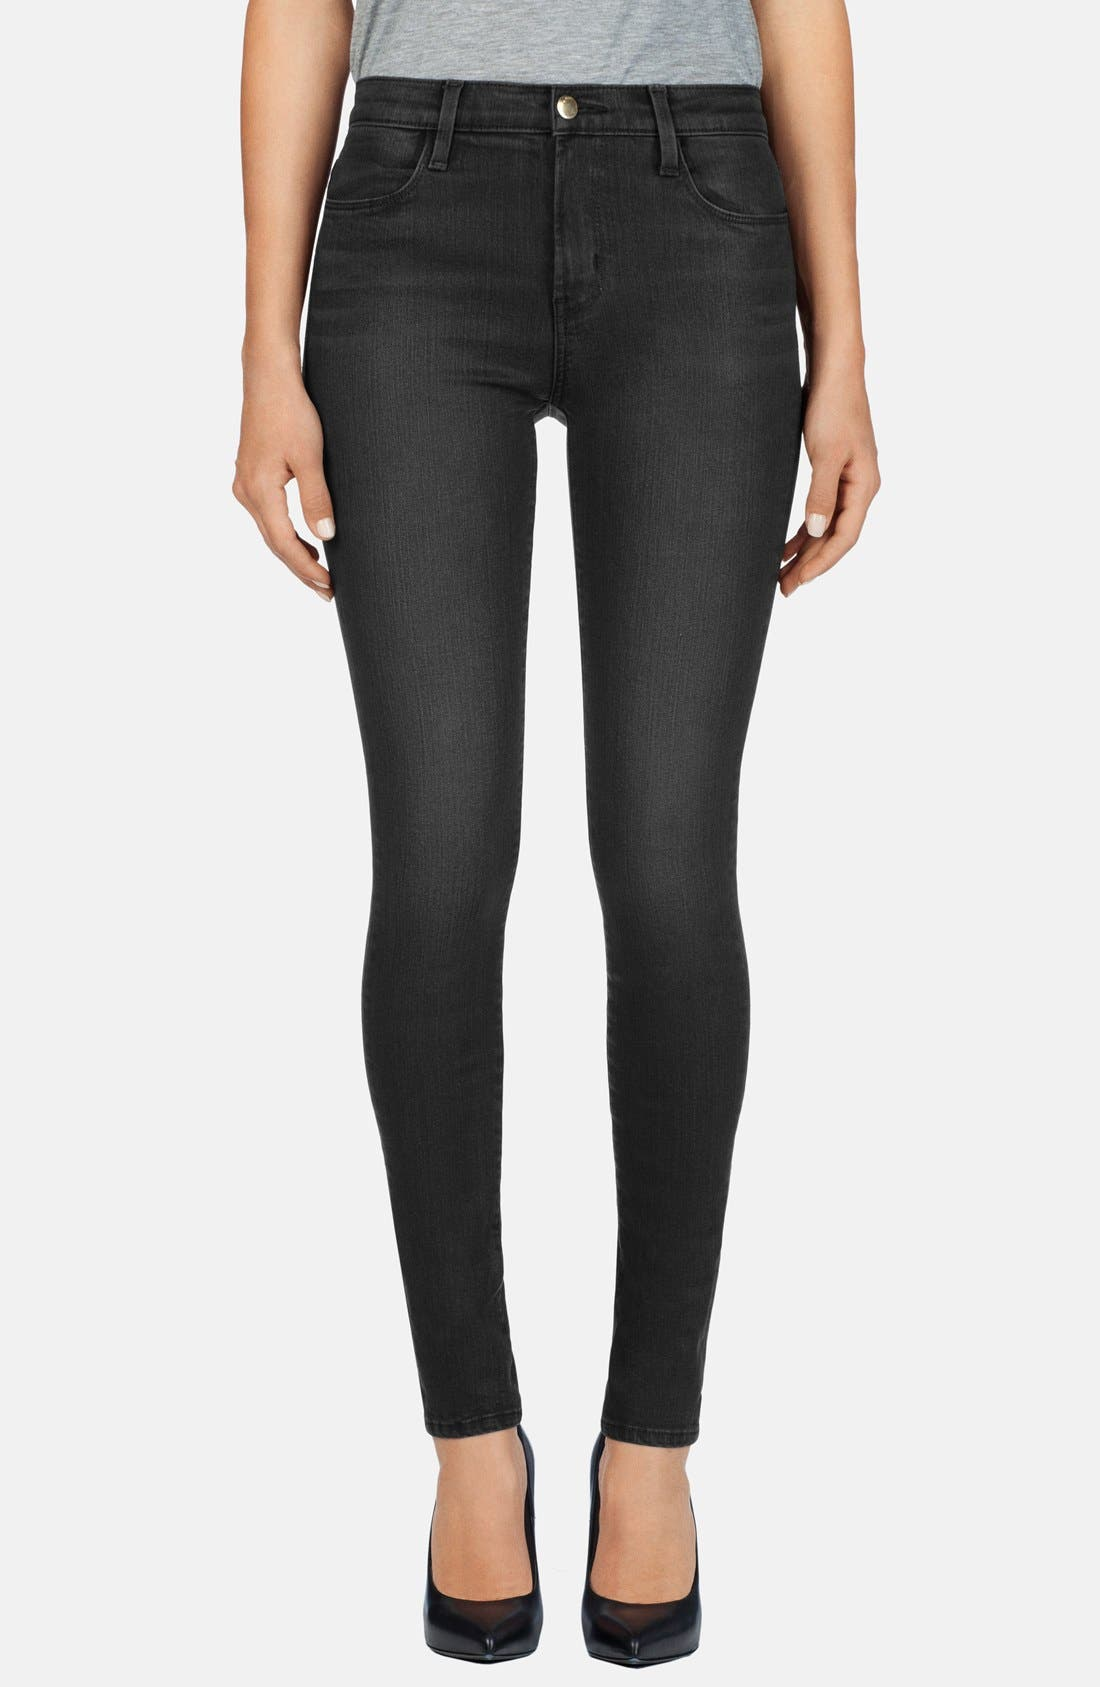 Alternate Image 1 Selected - J Brand '620' Mid Rise Skinny Jeans (Black Diamond)